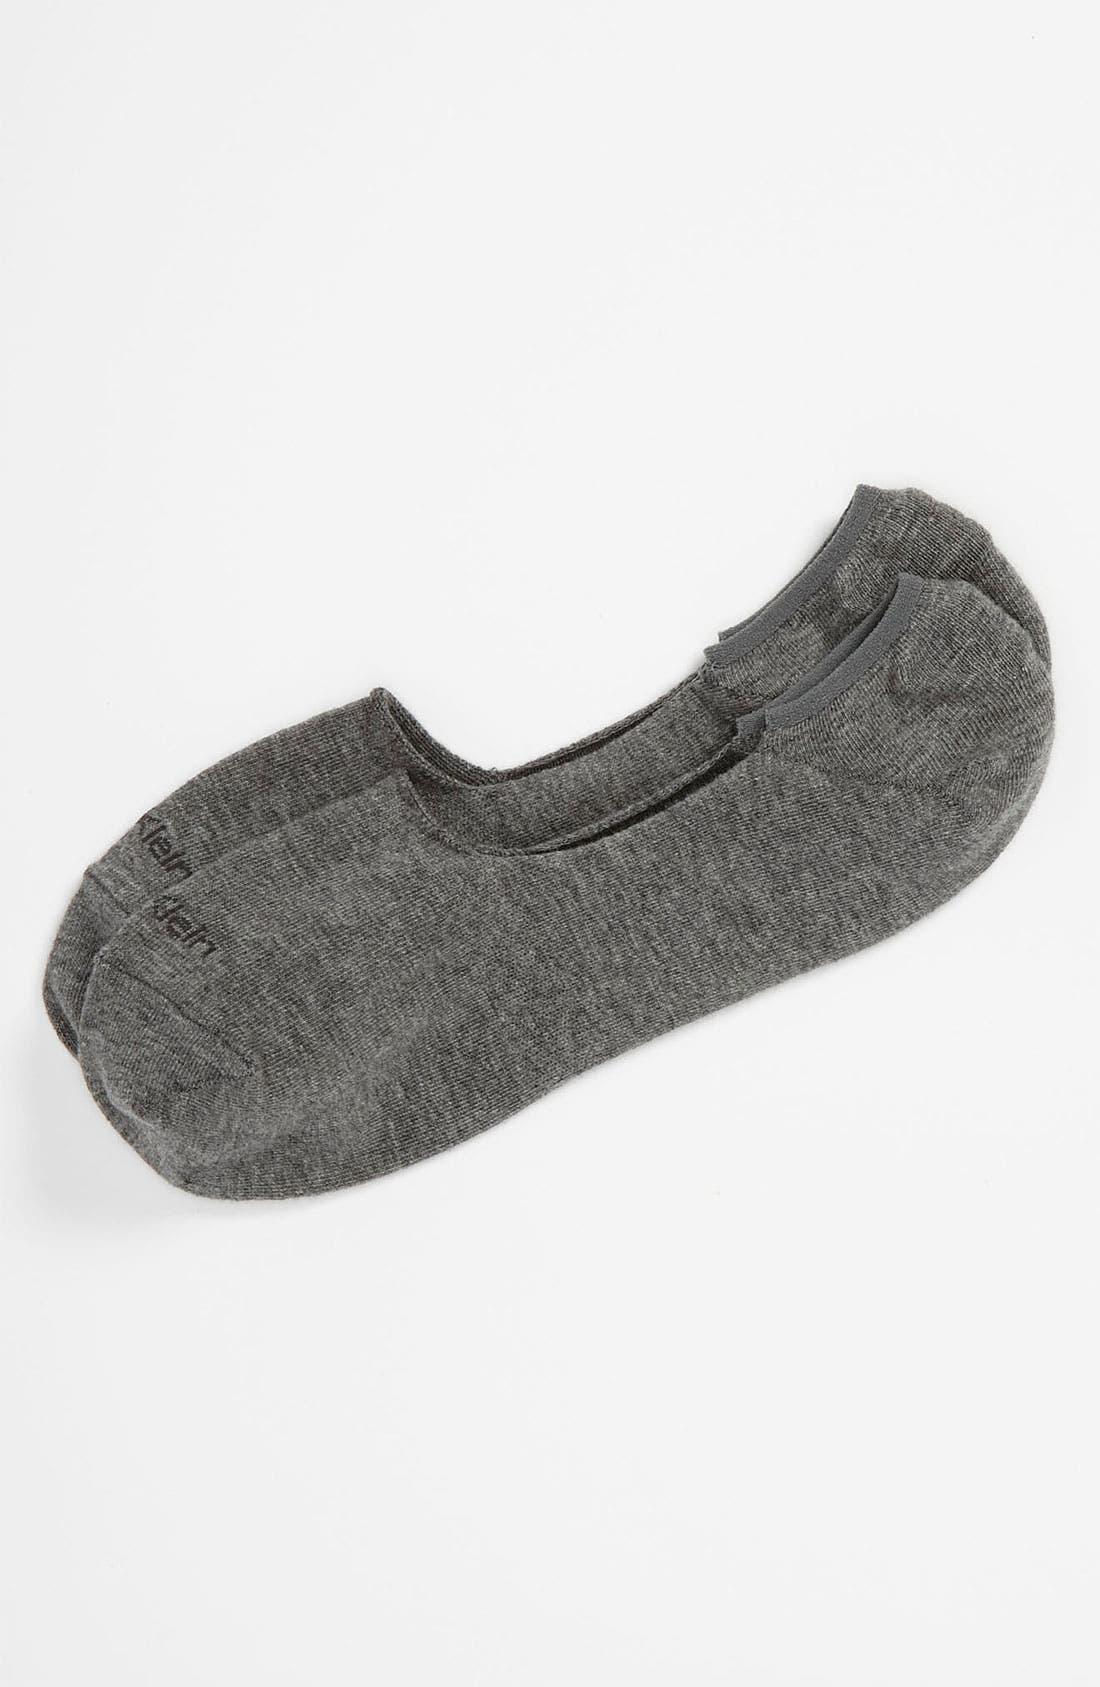 No-Show Socks,                         Main,                         color, GREY HEATHER